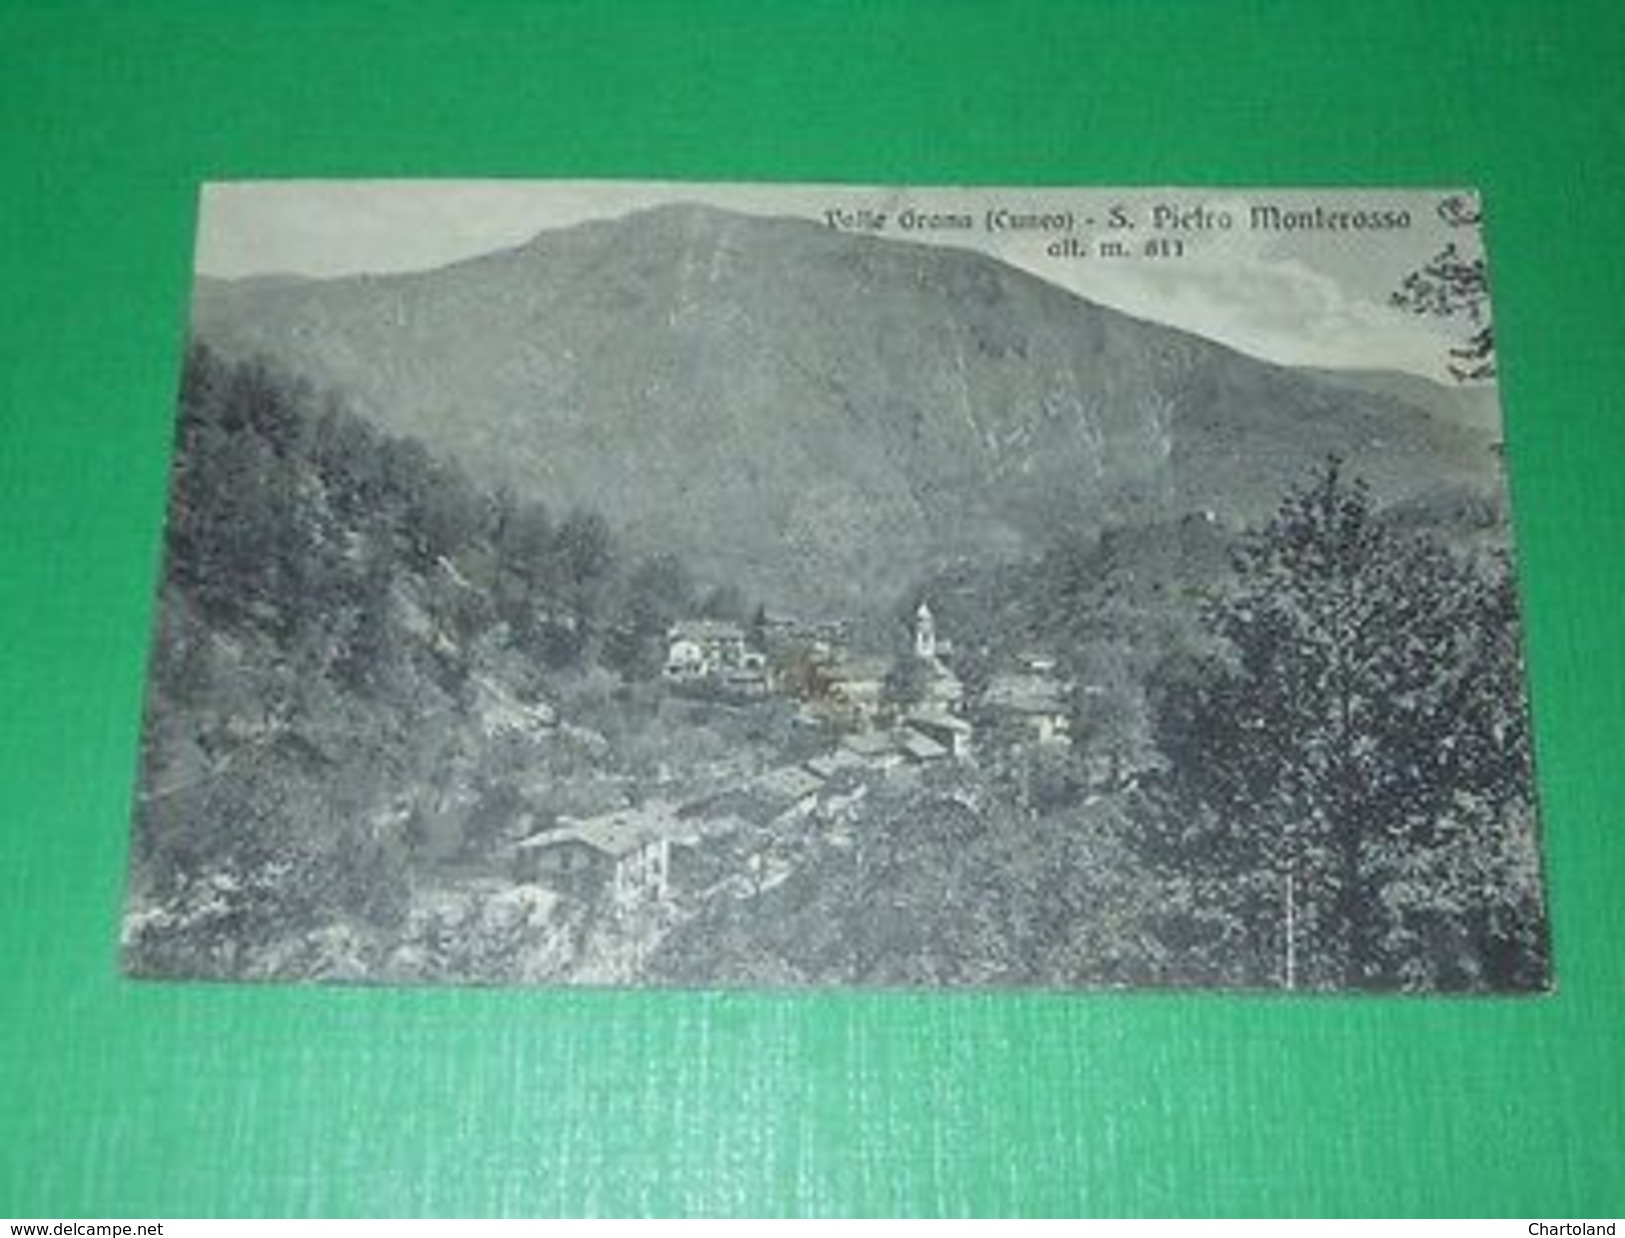 Cartolina Valle Grana ( Cuneo ) - S. Pietro Monterosso - Panorama 1933 - Cuneo